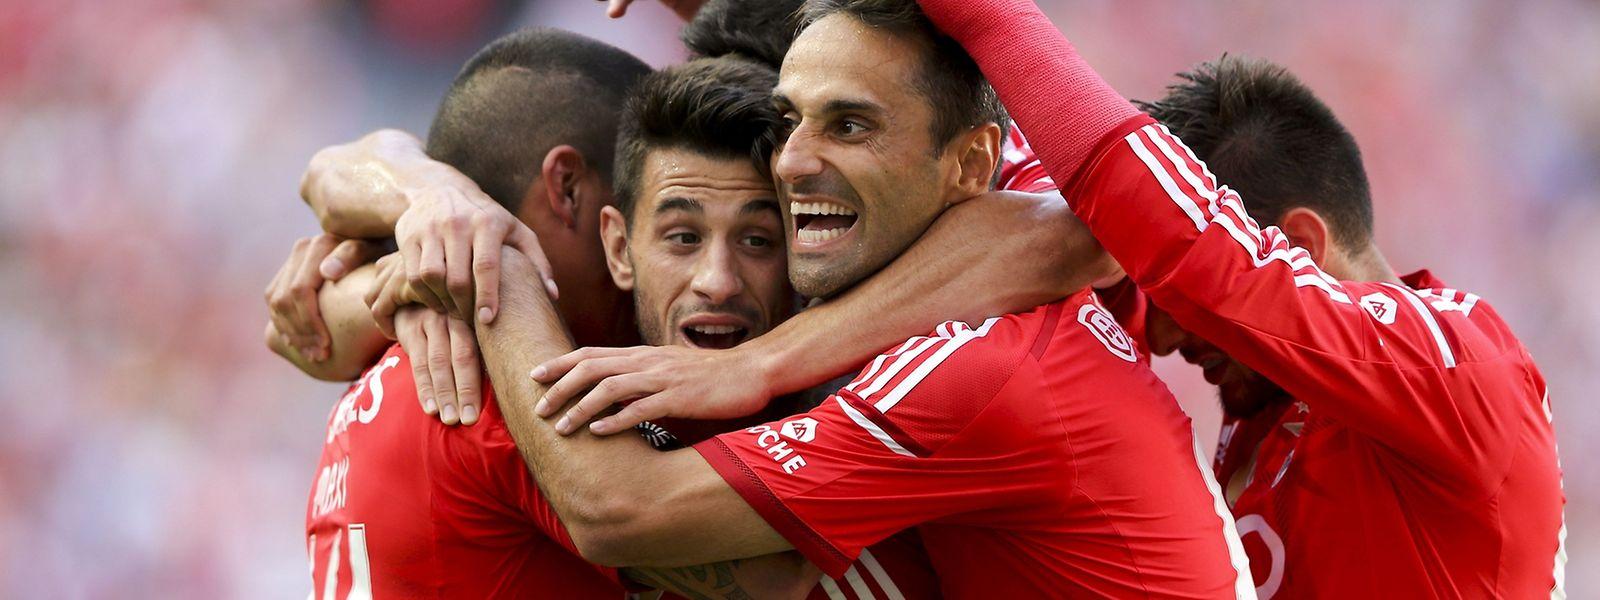 A goleada ao Penafiel agrante praticamente o título ao Benfica